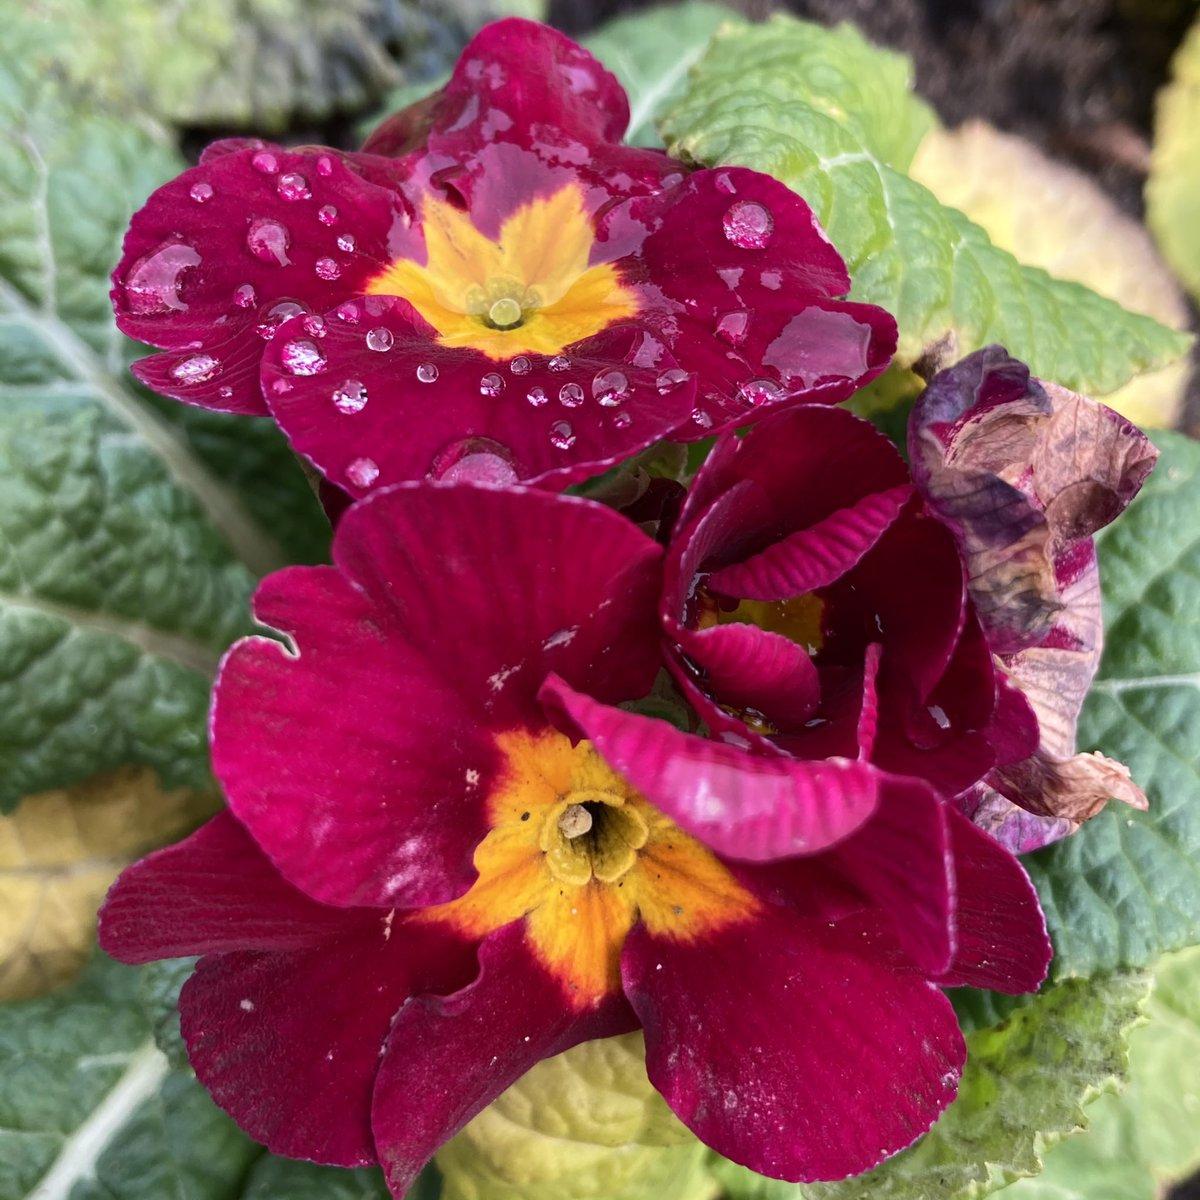 #TwitterFriends a little bit of brightness on a dark day. Enjoy. #Nature #Flowers #TomorrowWillBeABrighterDay #photo